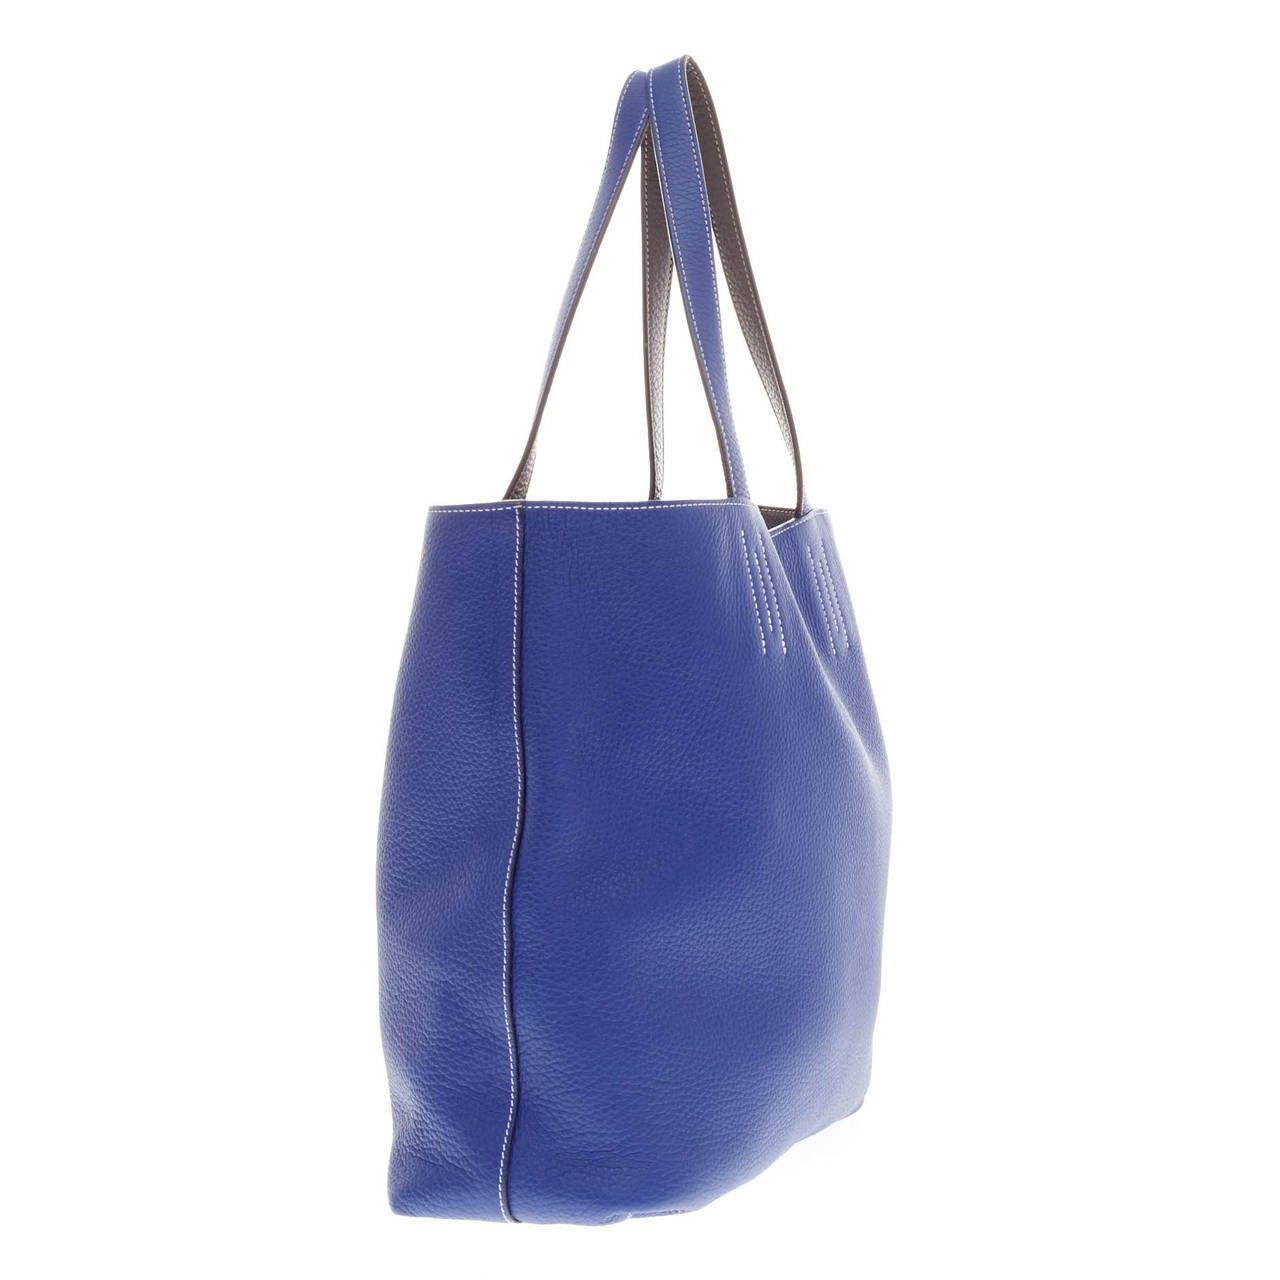 hermes bags sale - hermes brown leather handbag double sens